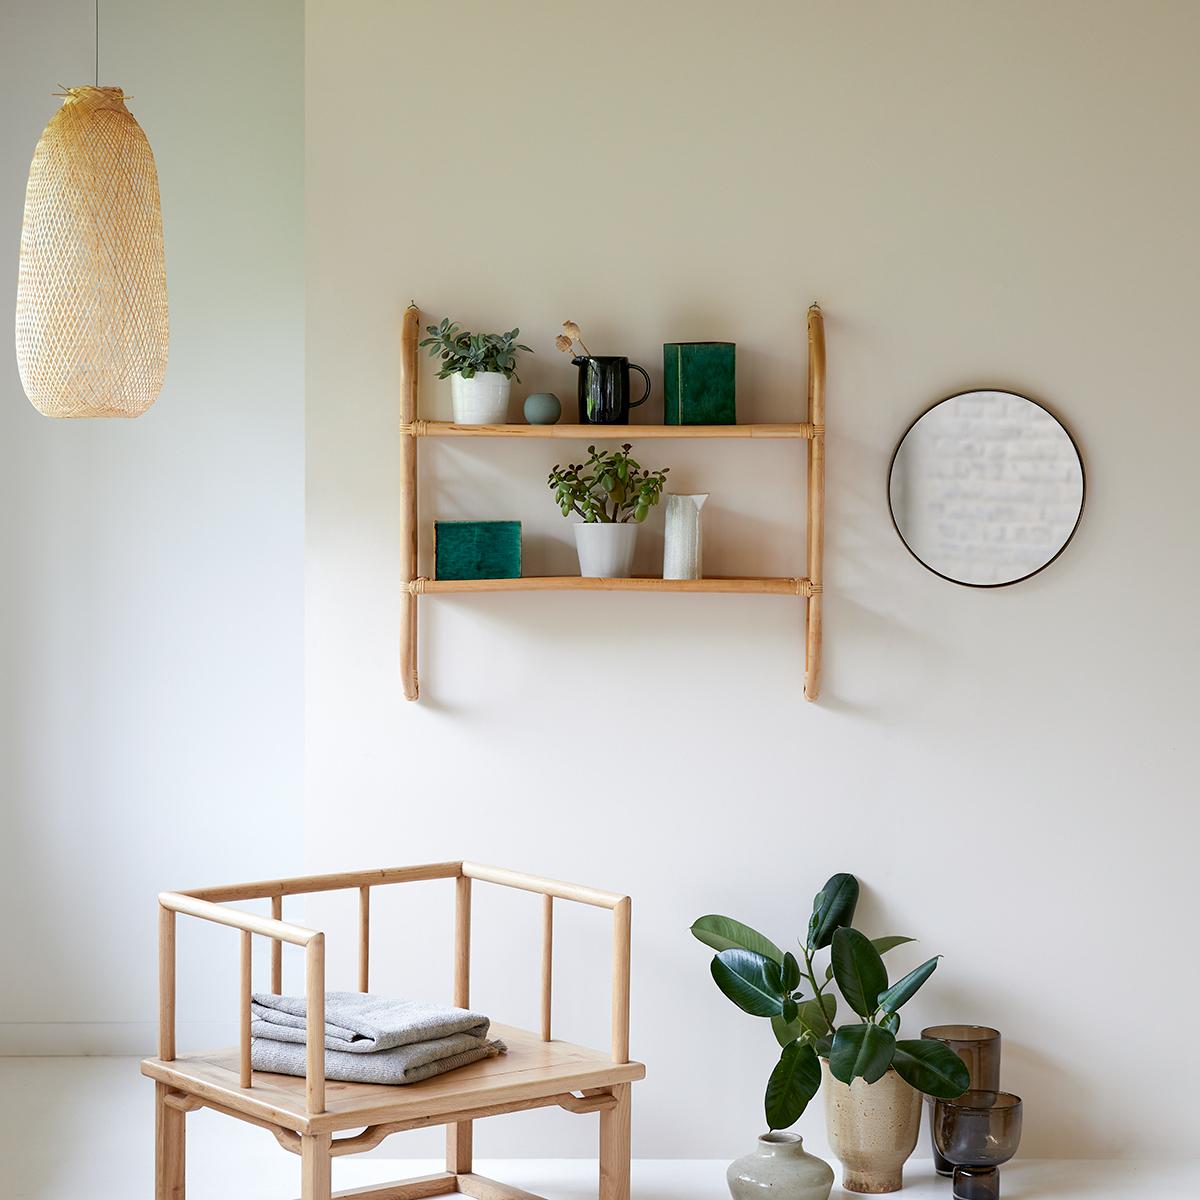 Marius rattan wall-mounted Shelf